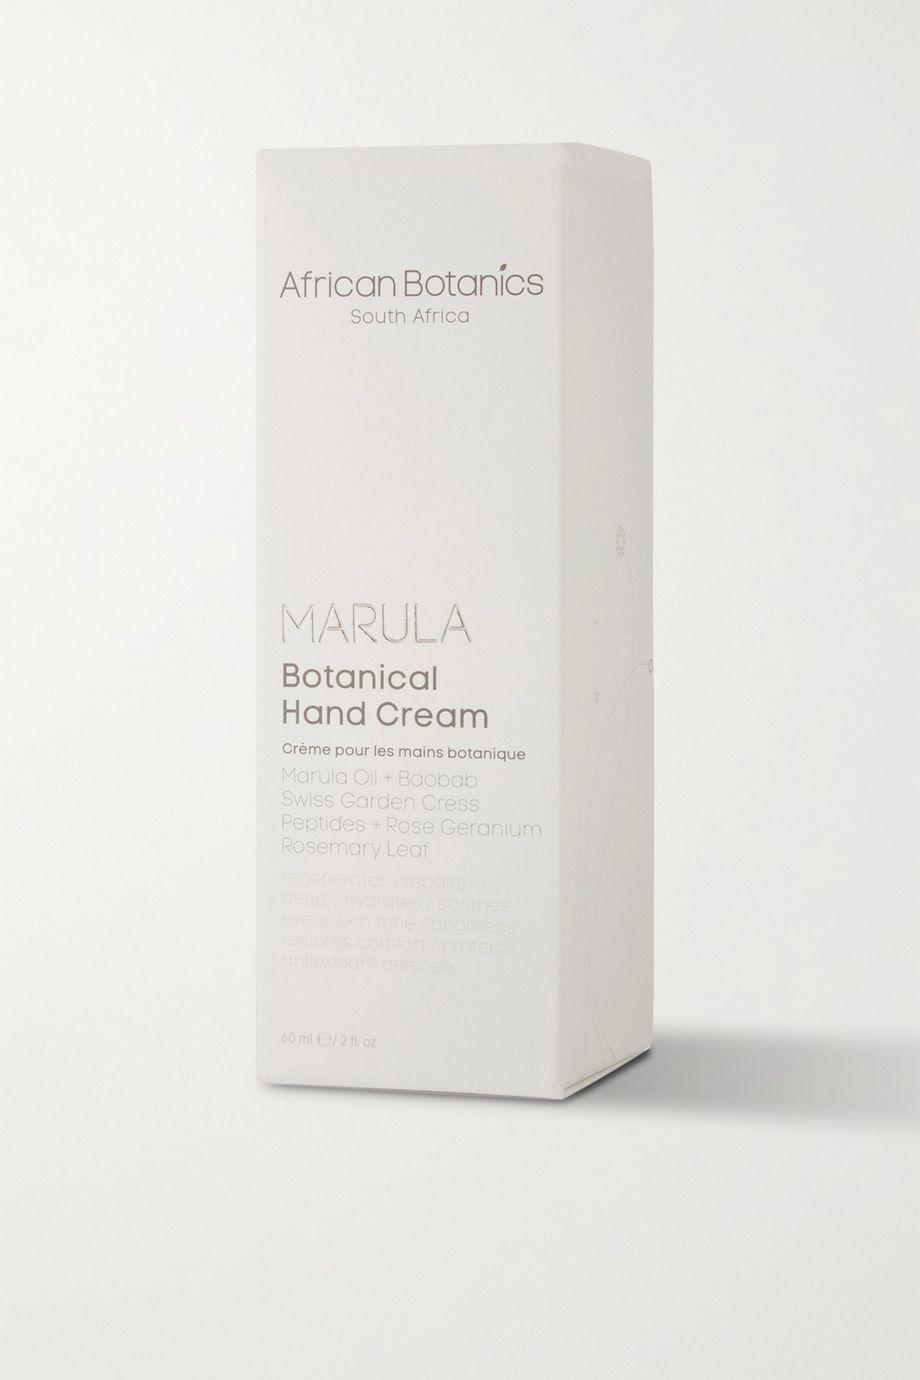 African Botanics Marula Botanical Hand Cream, 60ml